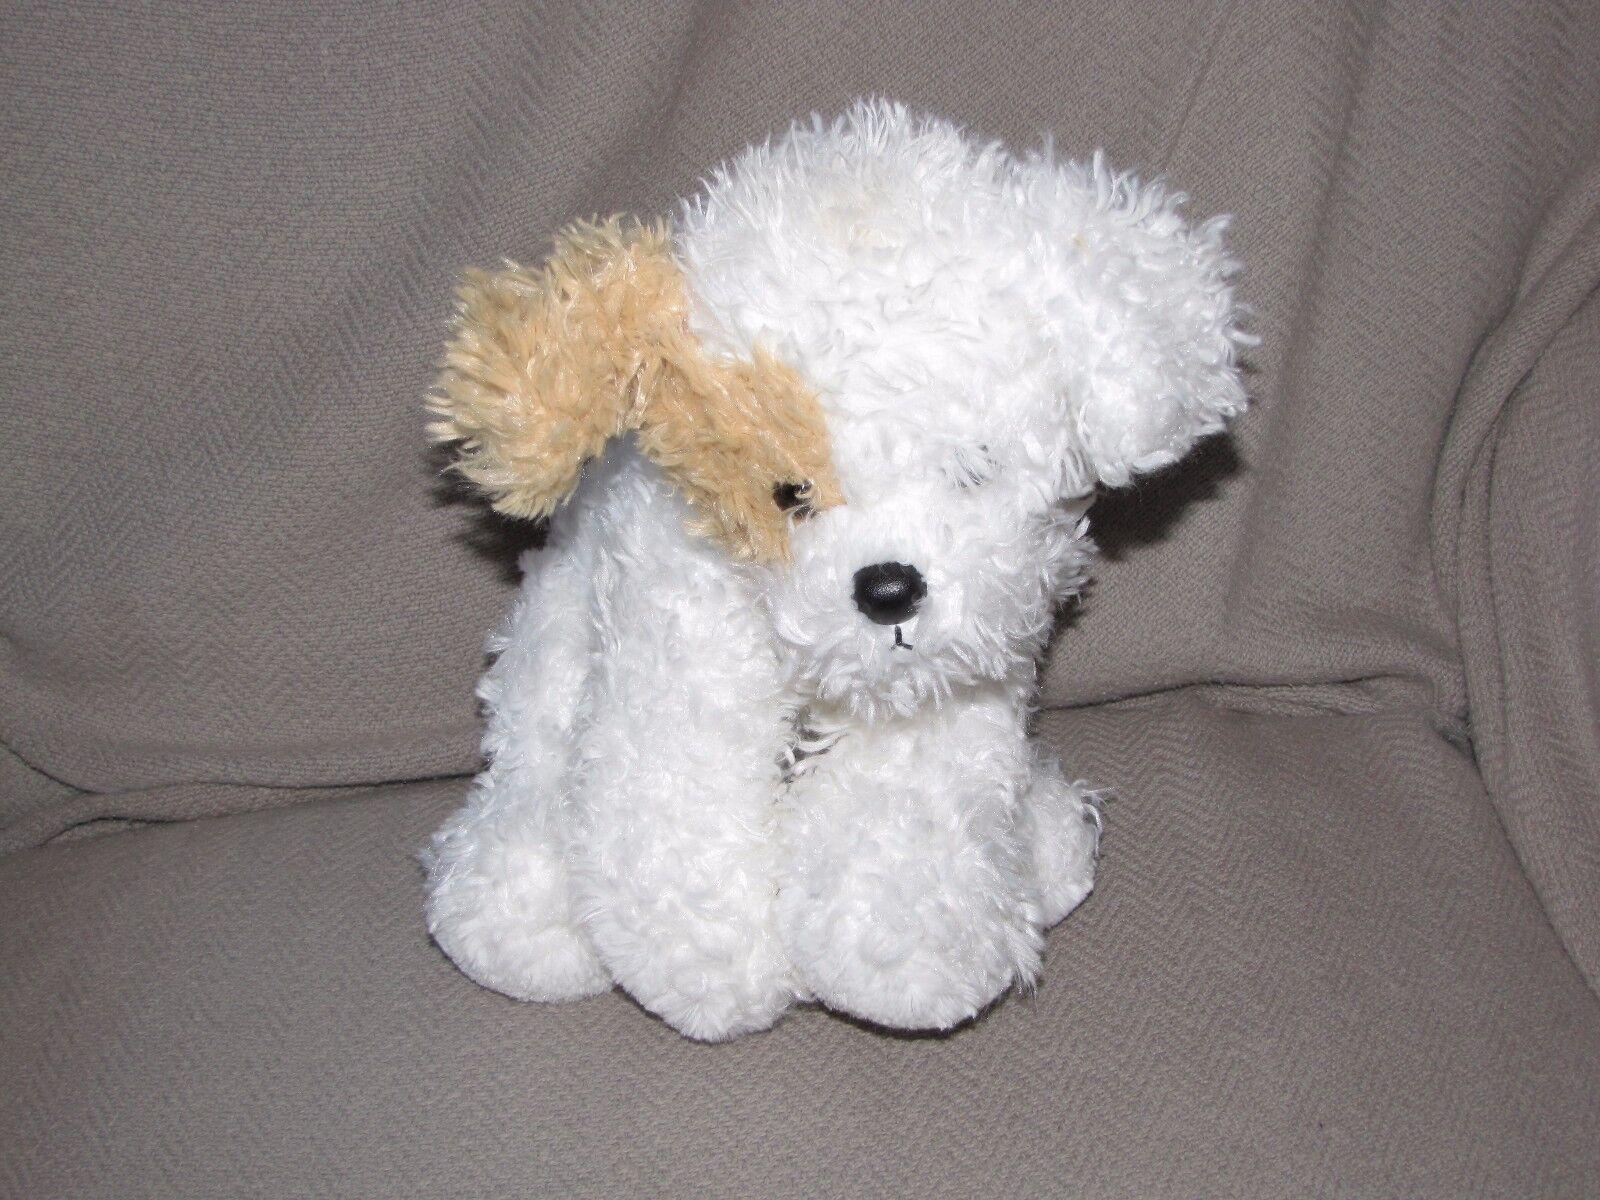 Dog Ty Classic 2006 Puppy TANDY 10 10 10  White with Tan ear & tail stuffed plush RARE dd68b4